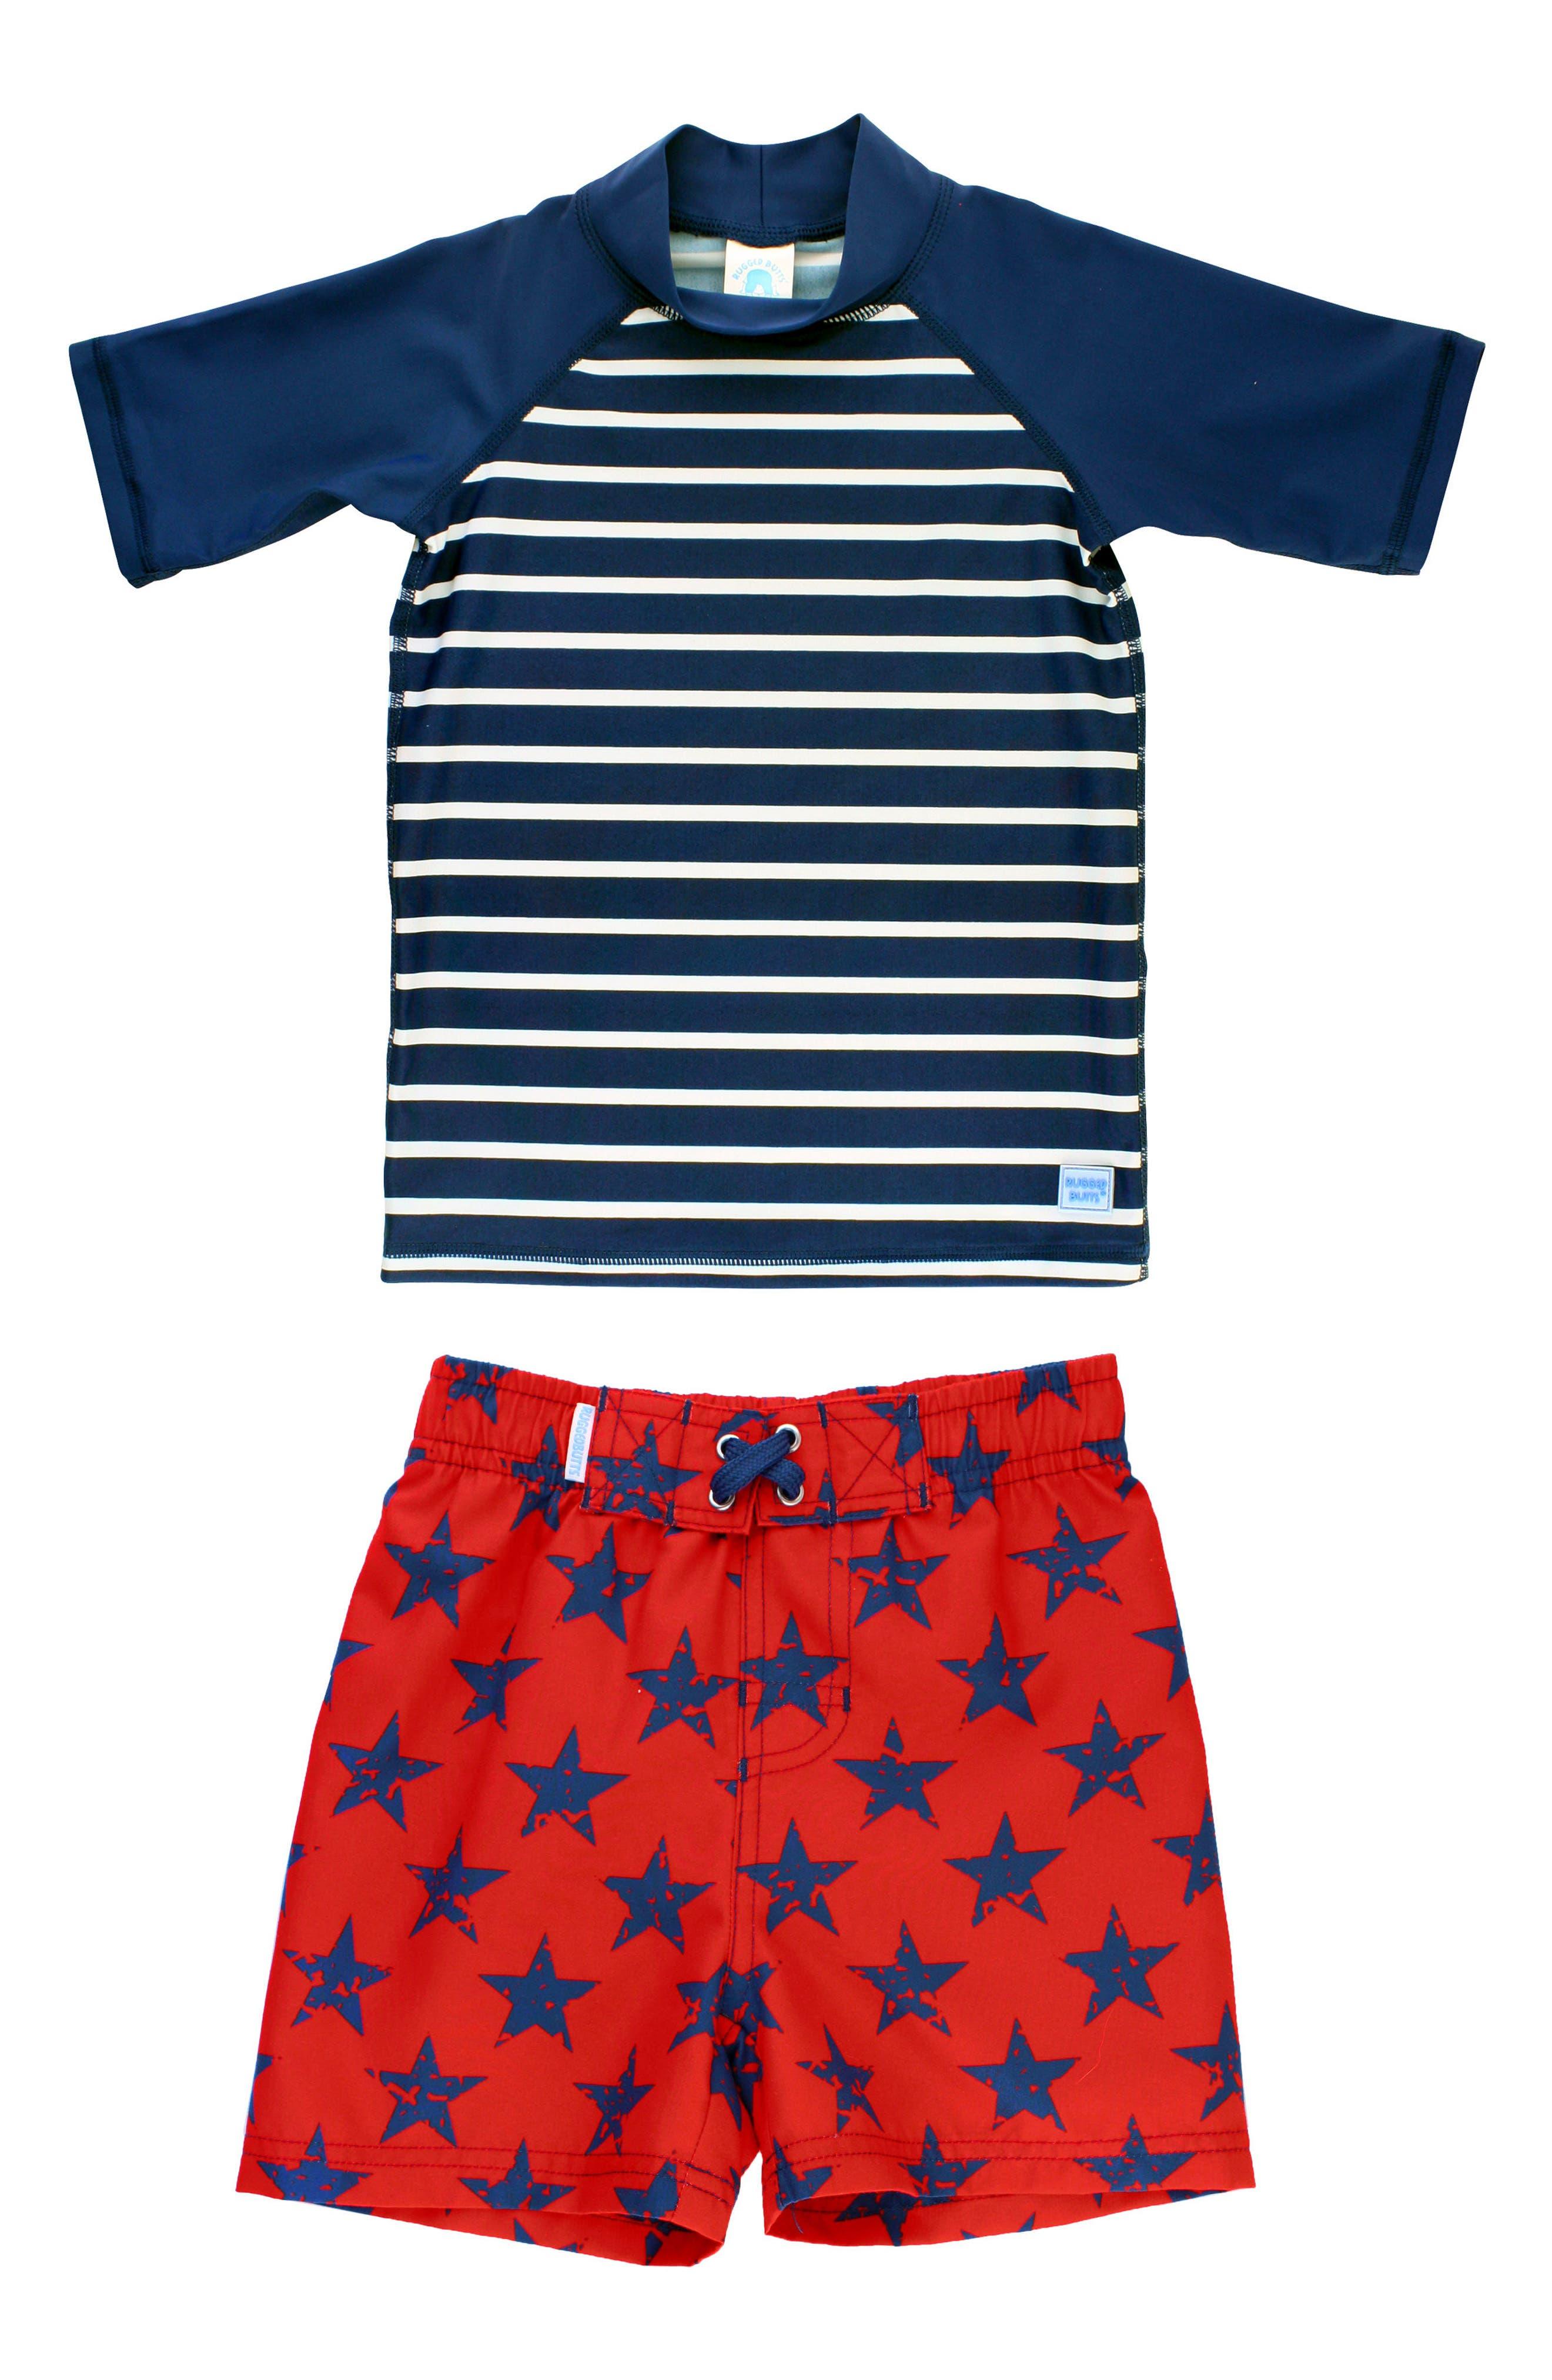 Navy Stripe Two-Piece Rashguard Swimsuit,                             Main thumbnail 1, color,                             Blue